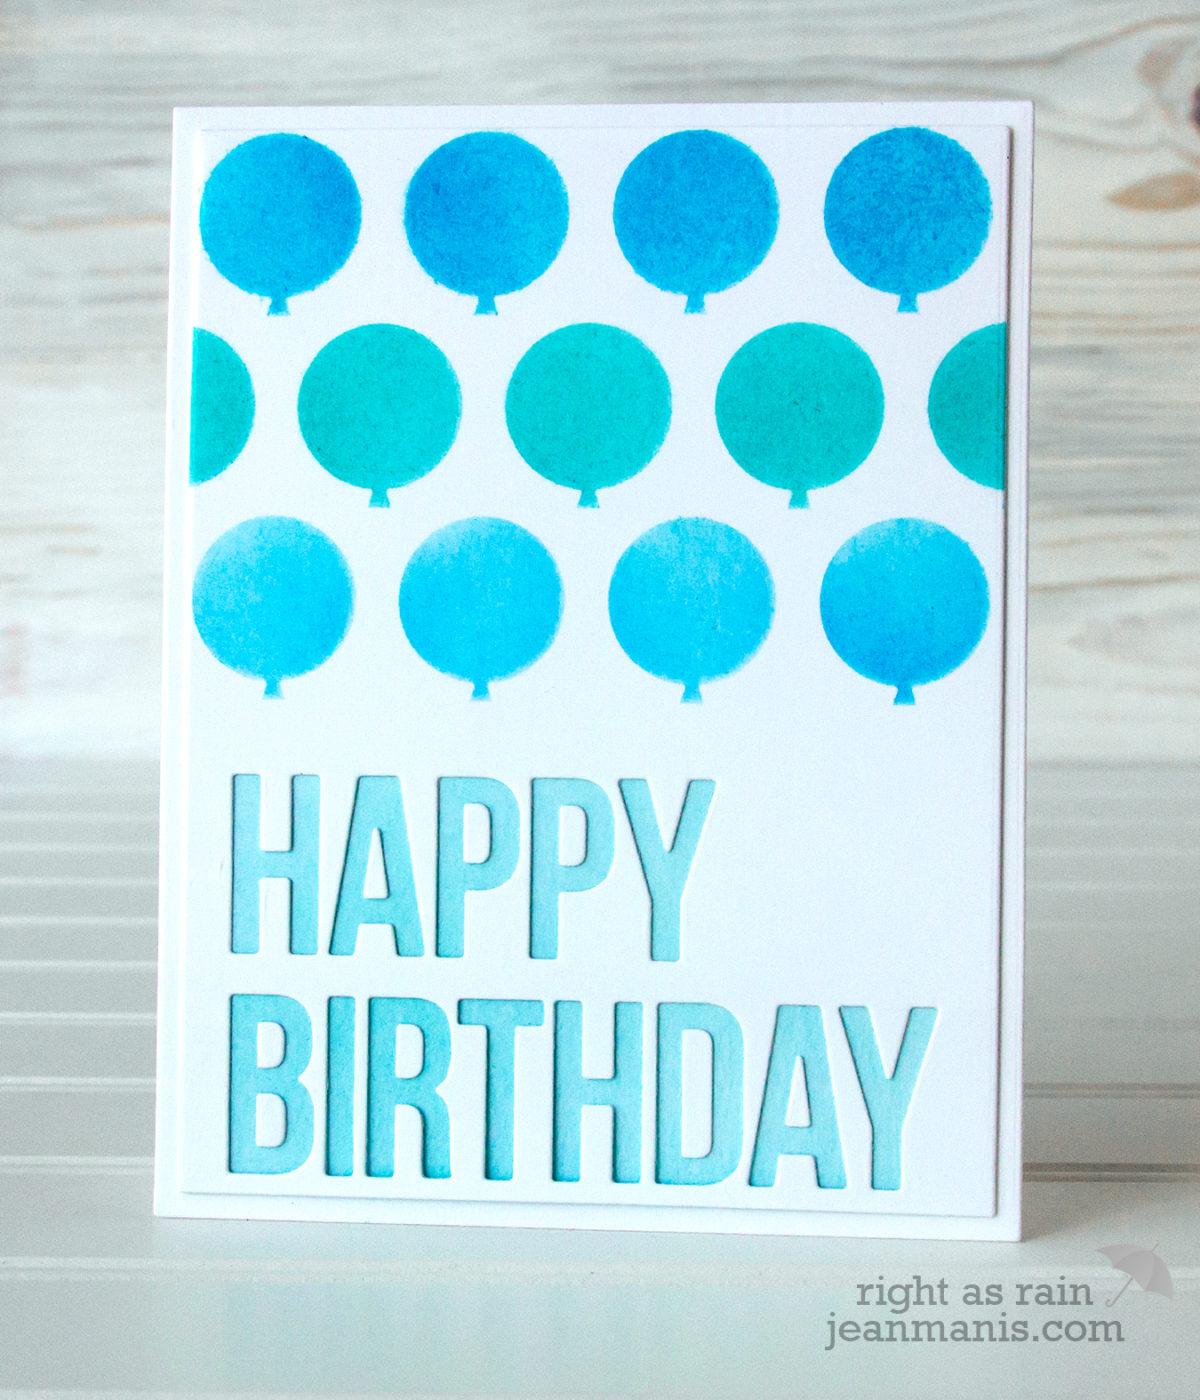 Happy Birthday Card – Echo Park Balloons Stencil